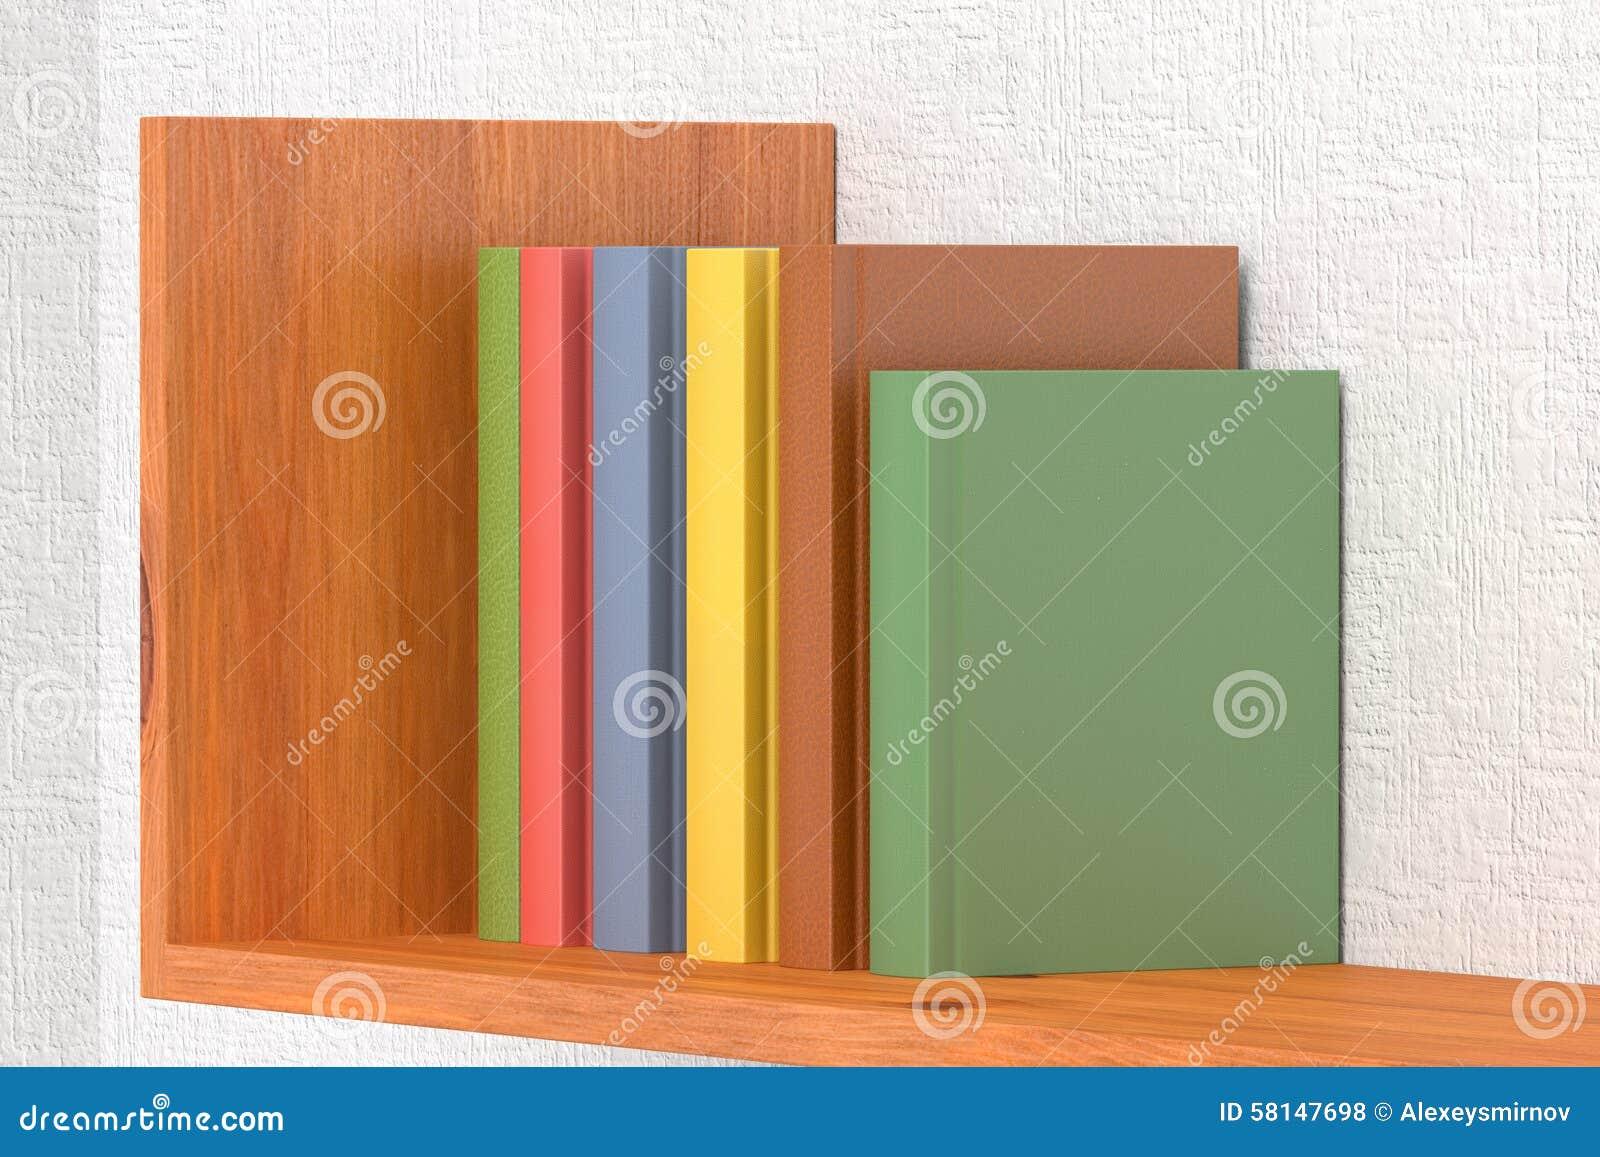 Download Colored Books On Wooden Bookshelf Stock Illustration